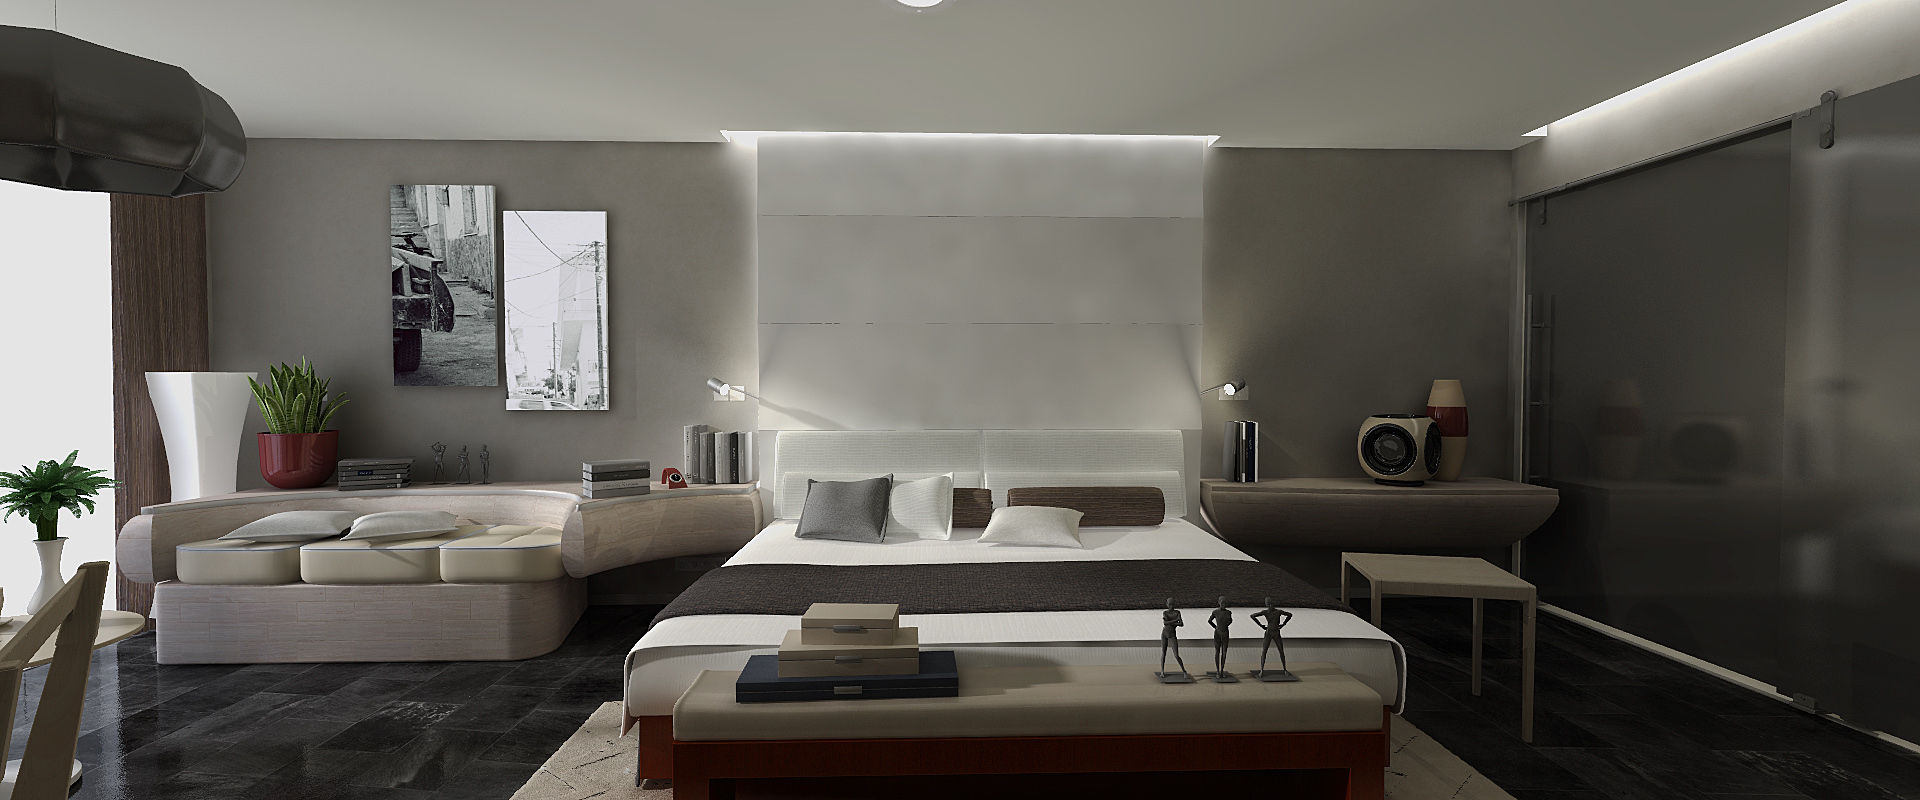 Dosch design dosch 3d hotel room furniture for Furniture for hotel rooms